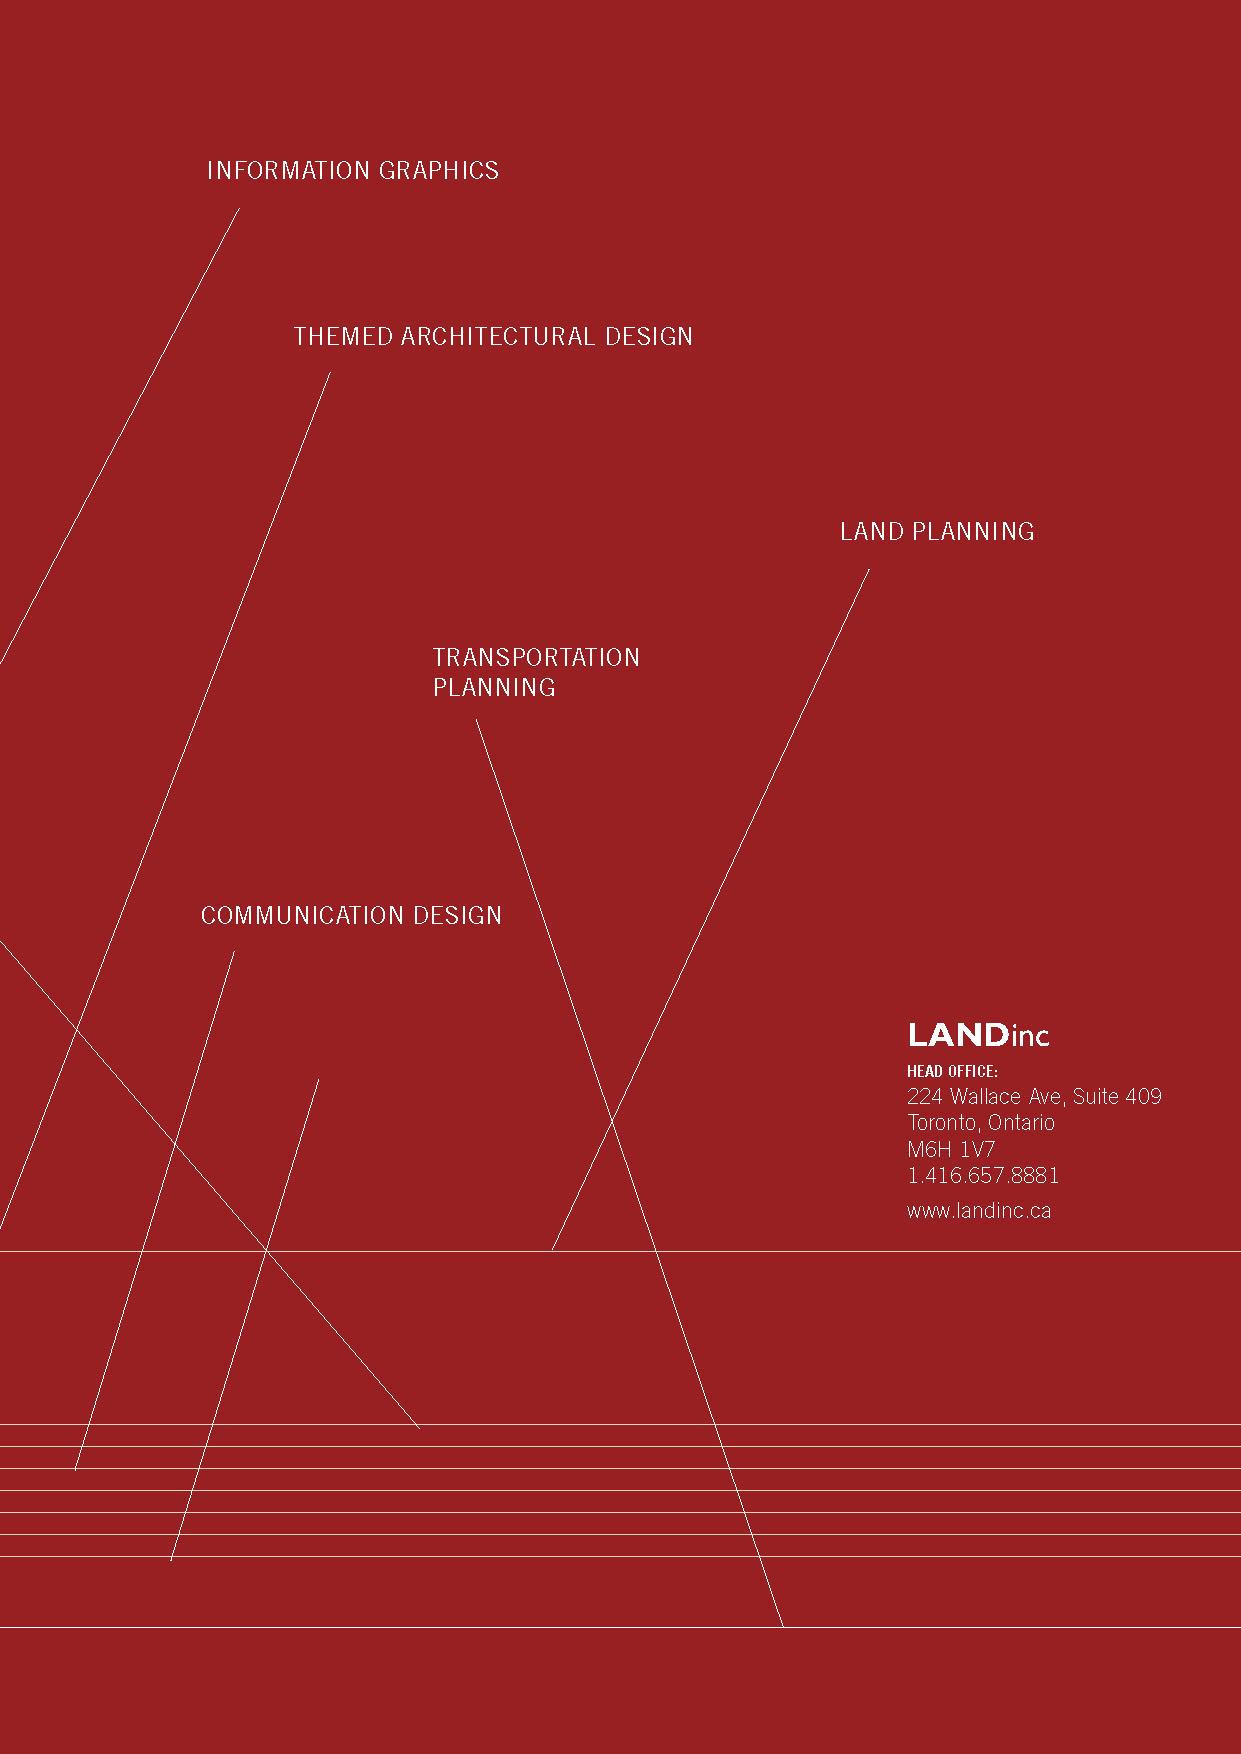 LANDinc_All_Page_003.jpg